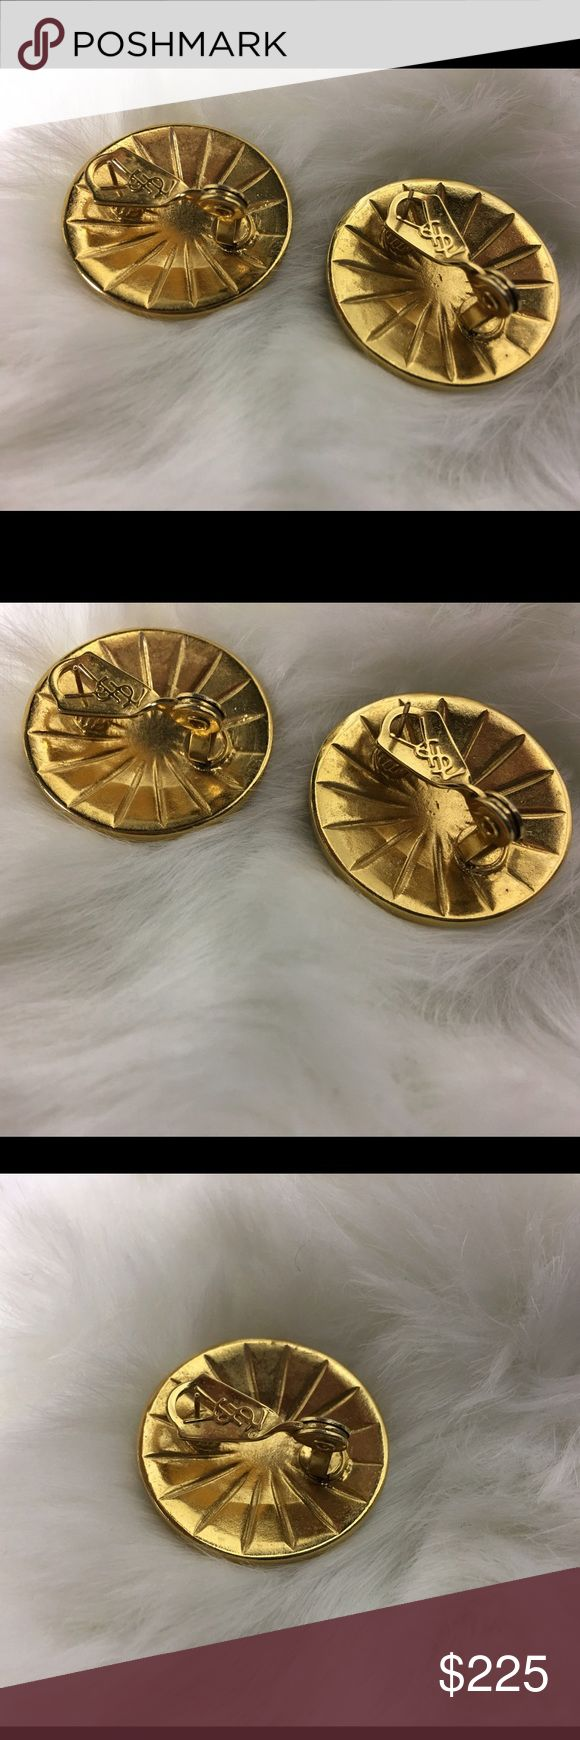 Vintage earrings YSL RARE Yves's Saint Laurent Rare vintage black and gold YSL earrings Yves Saint Laurent Accessories